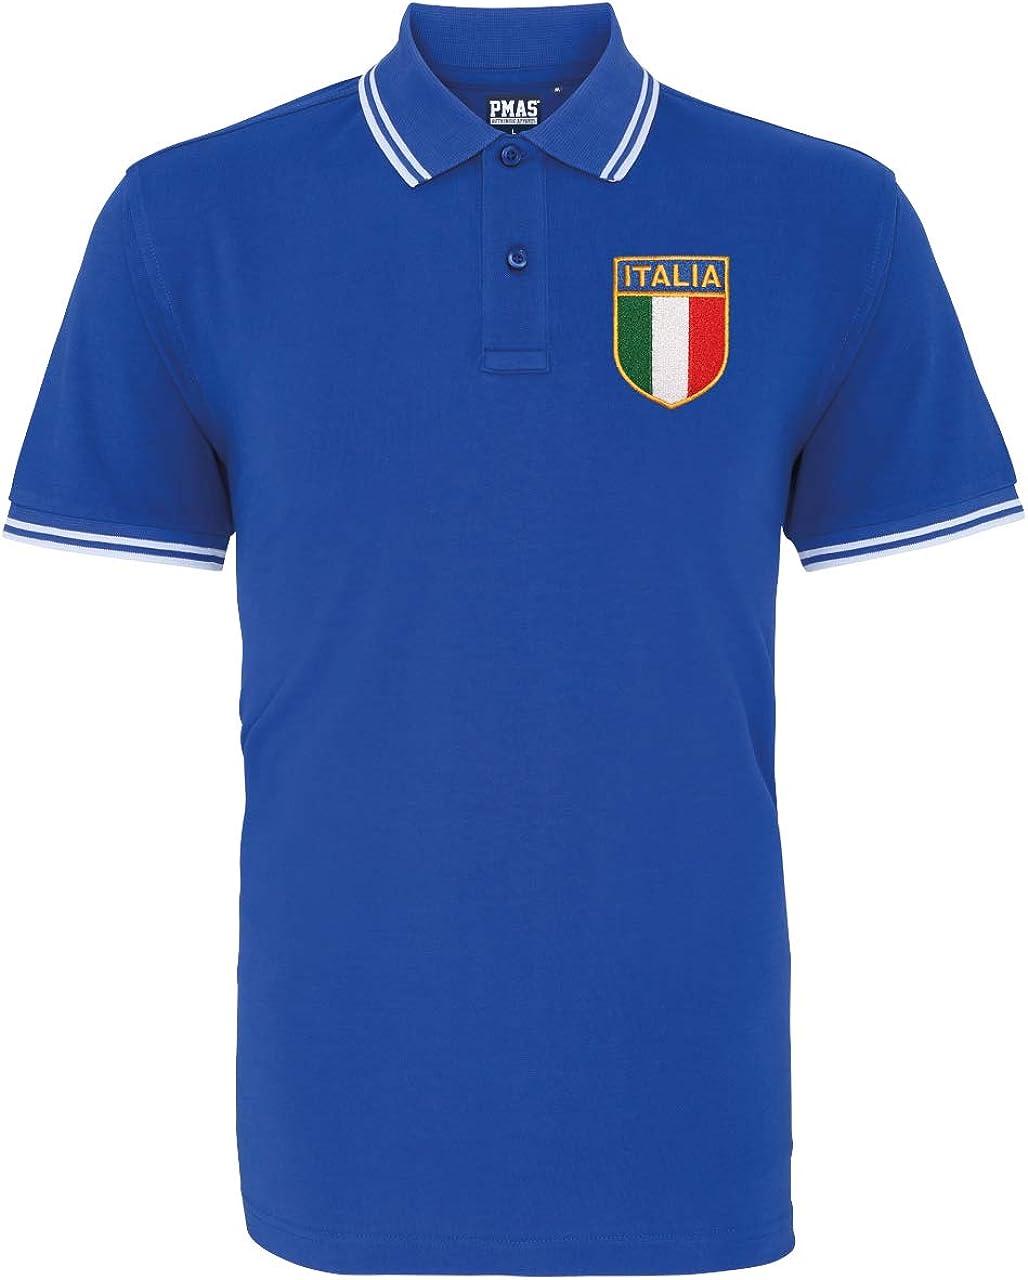 Retro para hombre Italia Rugby – Polo para hombre, Multicolore ...